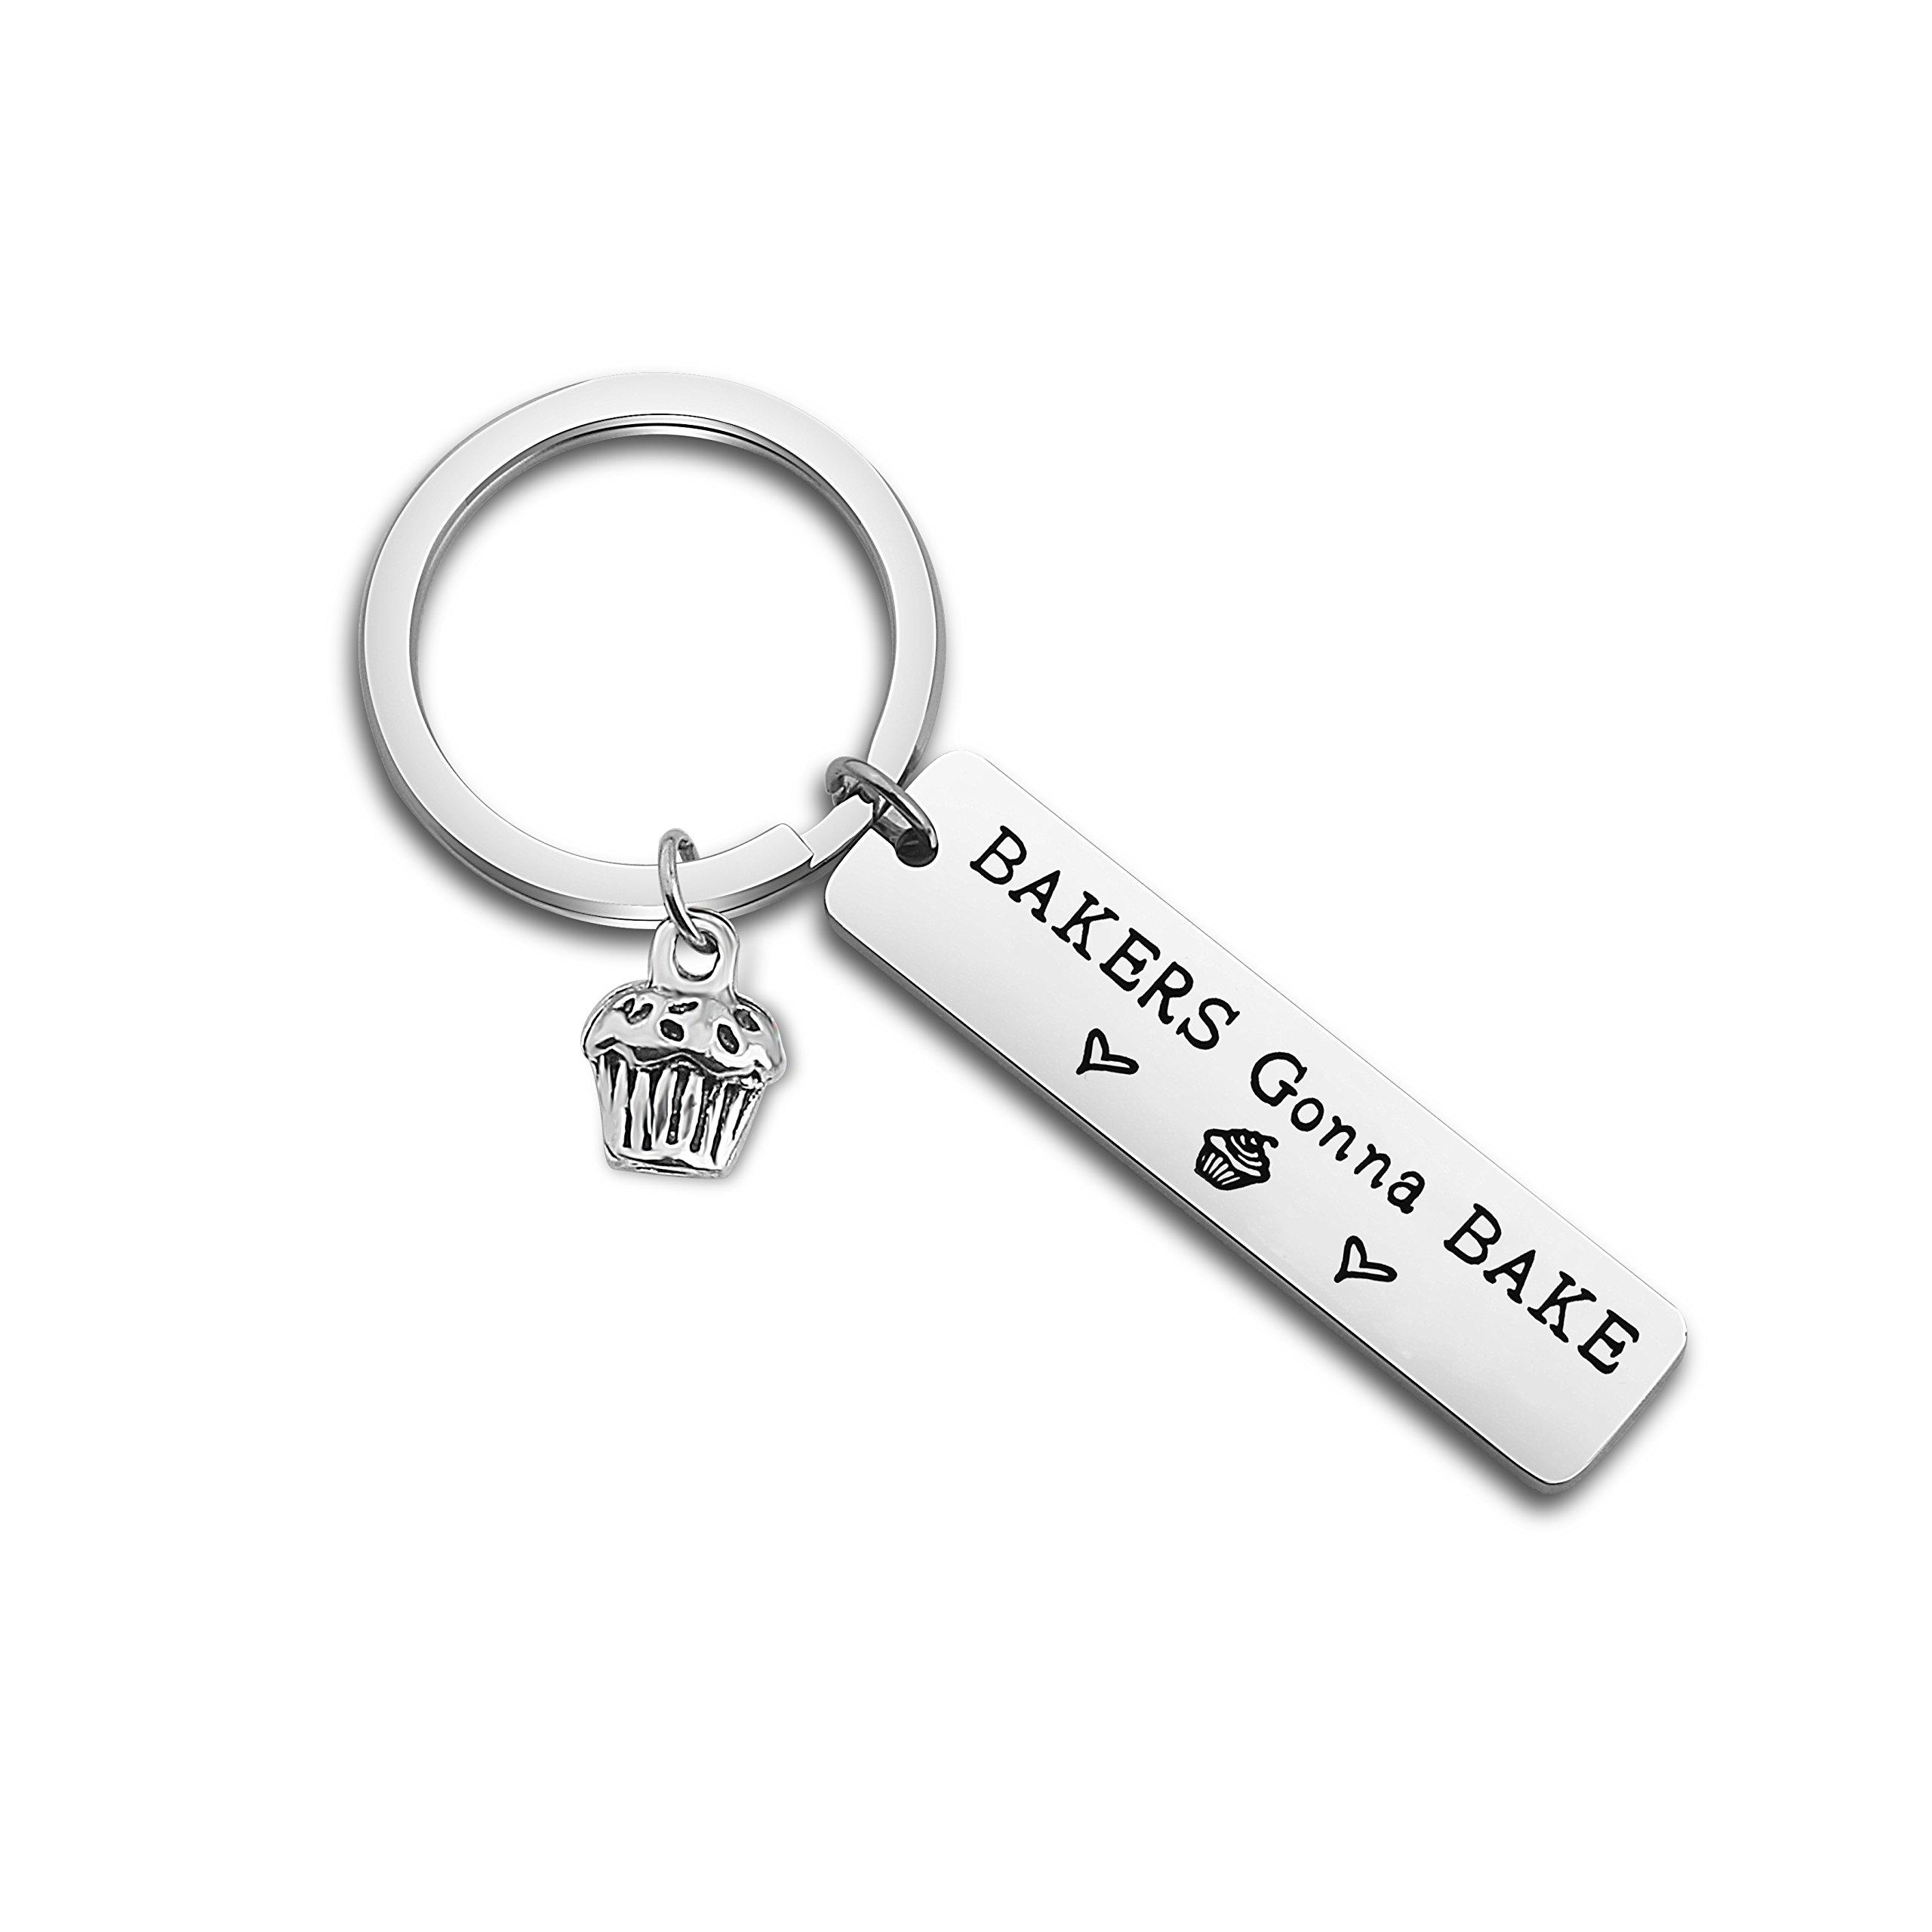 ENSIANTH Baker Gift Bakers Gonna Bake Keychain Cupcake Charm Jewelry Baking Theme Keychain Pastry Chef Gift (Baker Keychain) by ENSIANTH